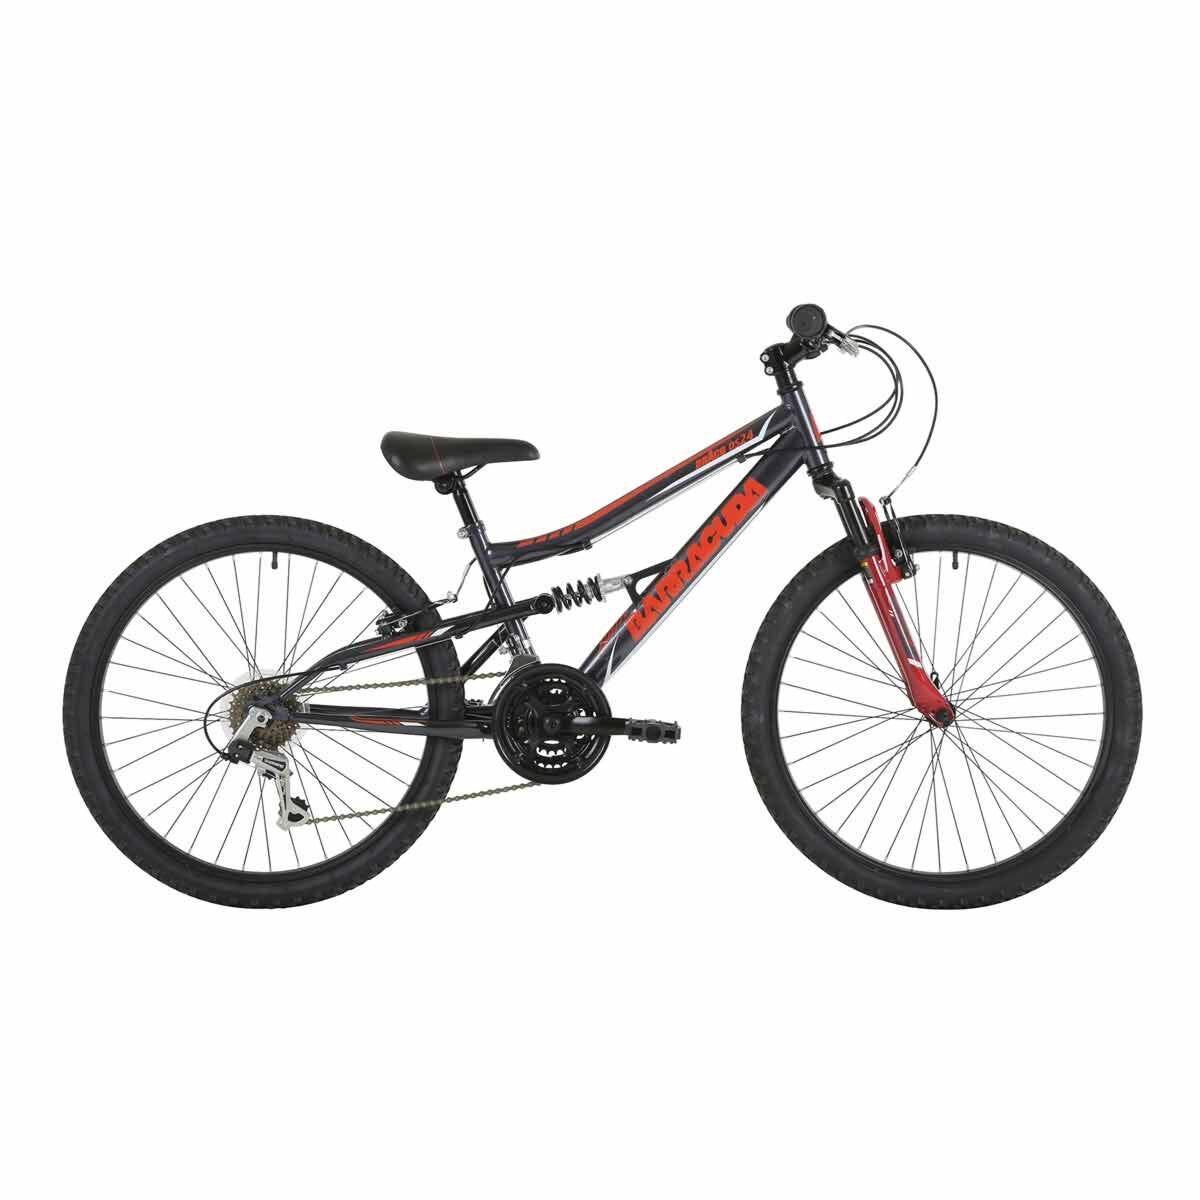 Barracuda Draco Dual Suspension Kids Bike 24 Inch Wheel